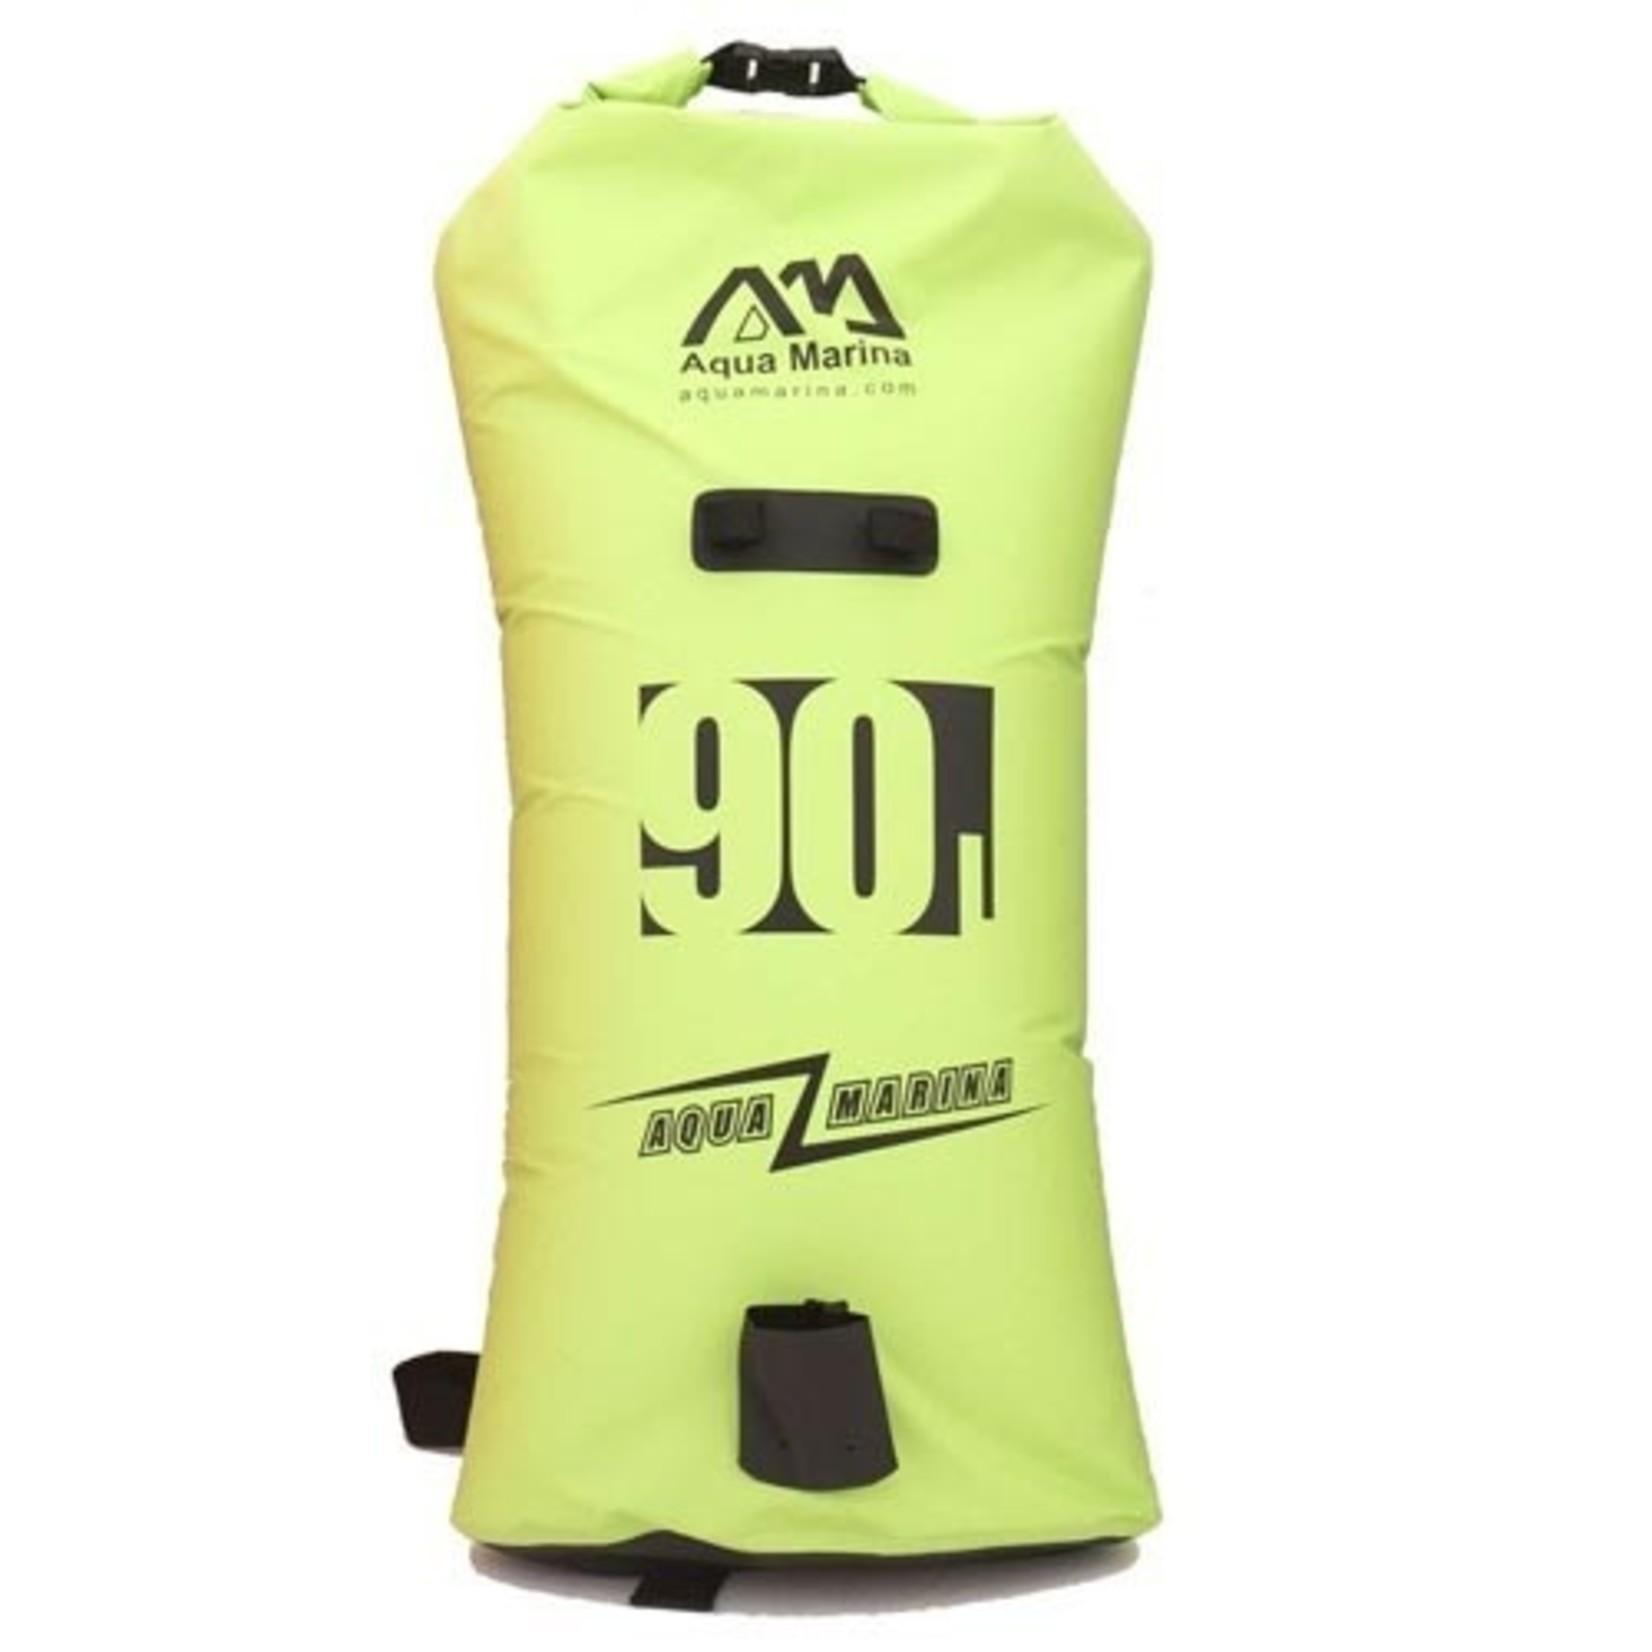 Aqua Marina Backpack 90L - Large